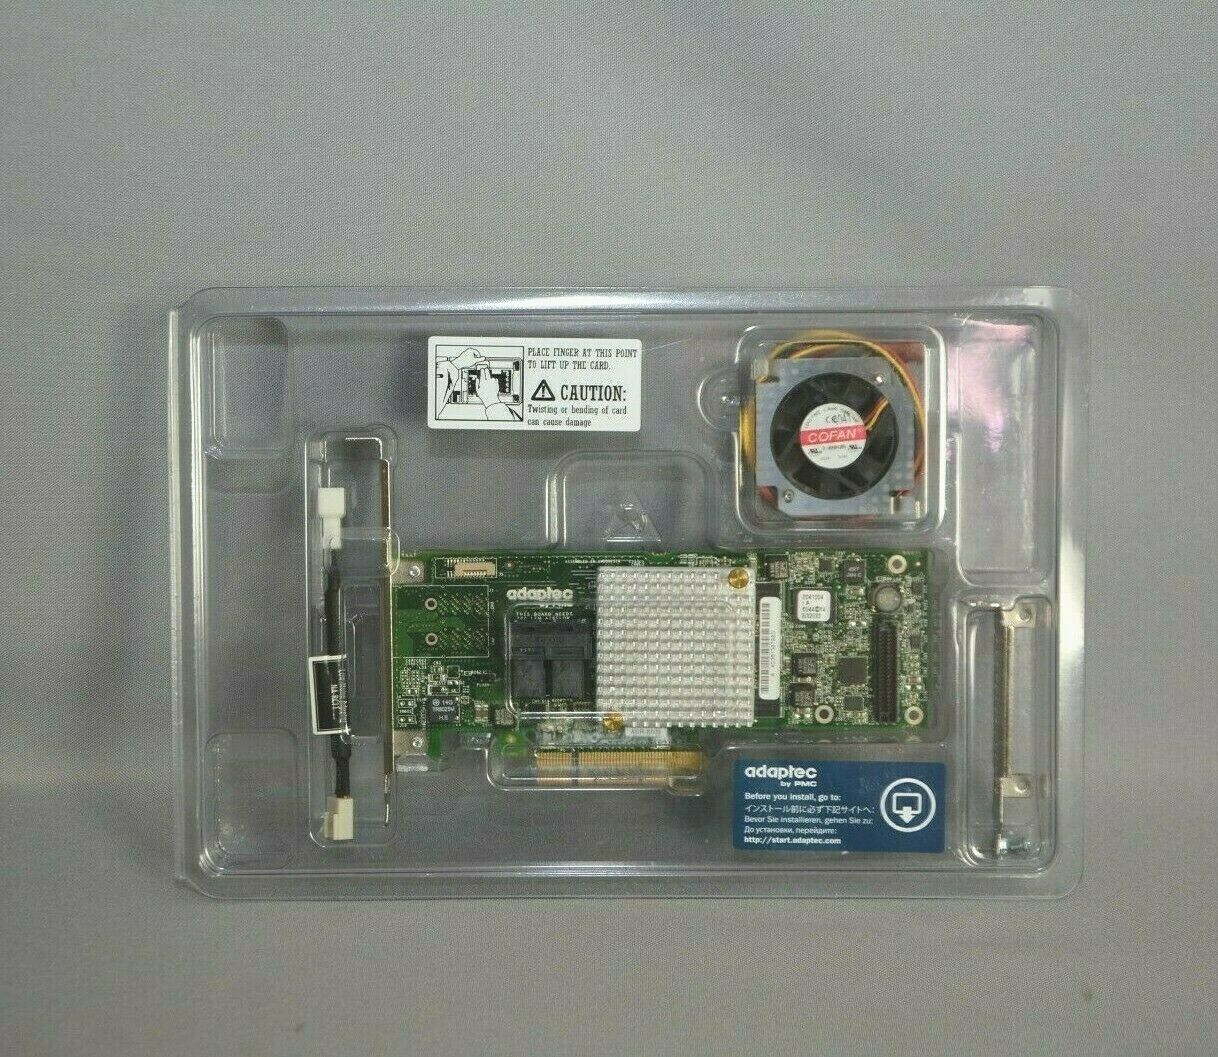 Adaptec RAID 8805 12 Gbps PCIe 3.0 x8 Gen3 SAS/SATA Controller Card Adapter New